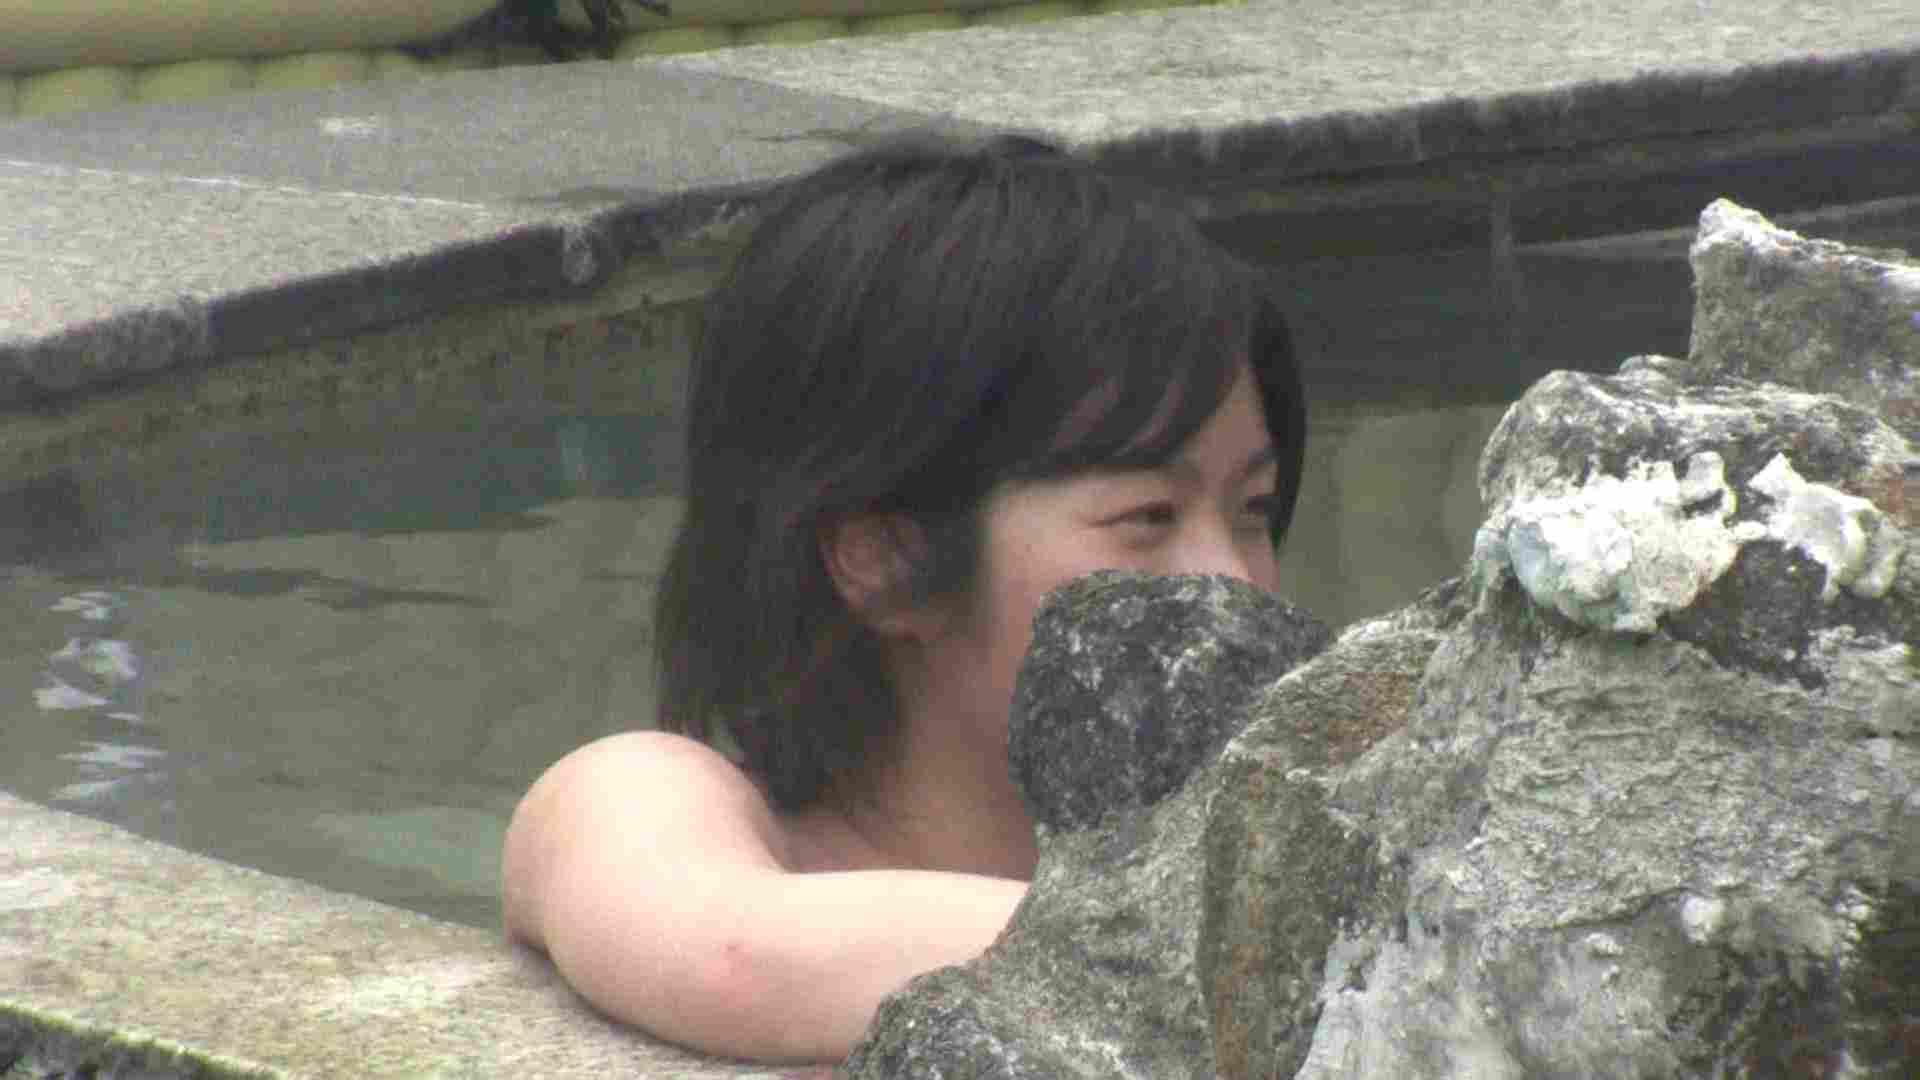 Aquaな露天風呂Vol.537 OL女体 性交動画流出 81連発 53